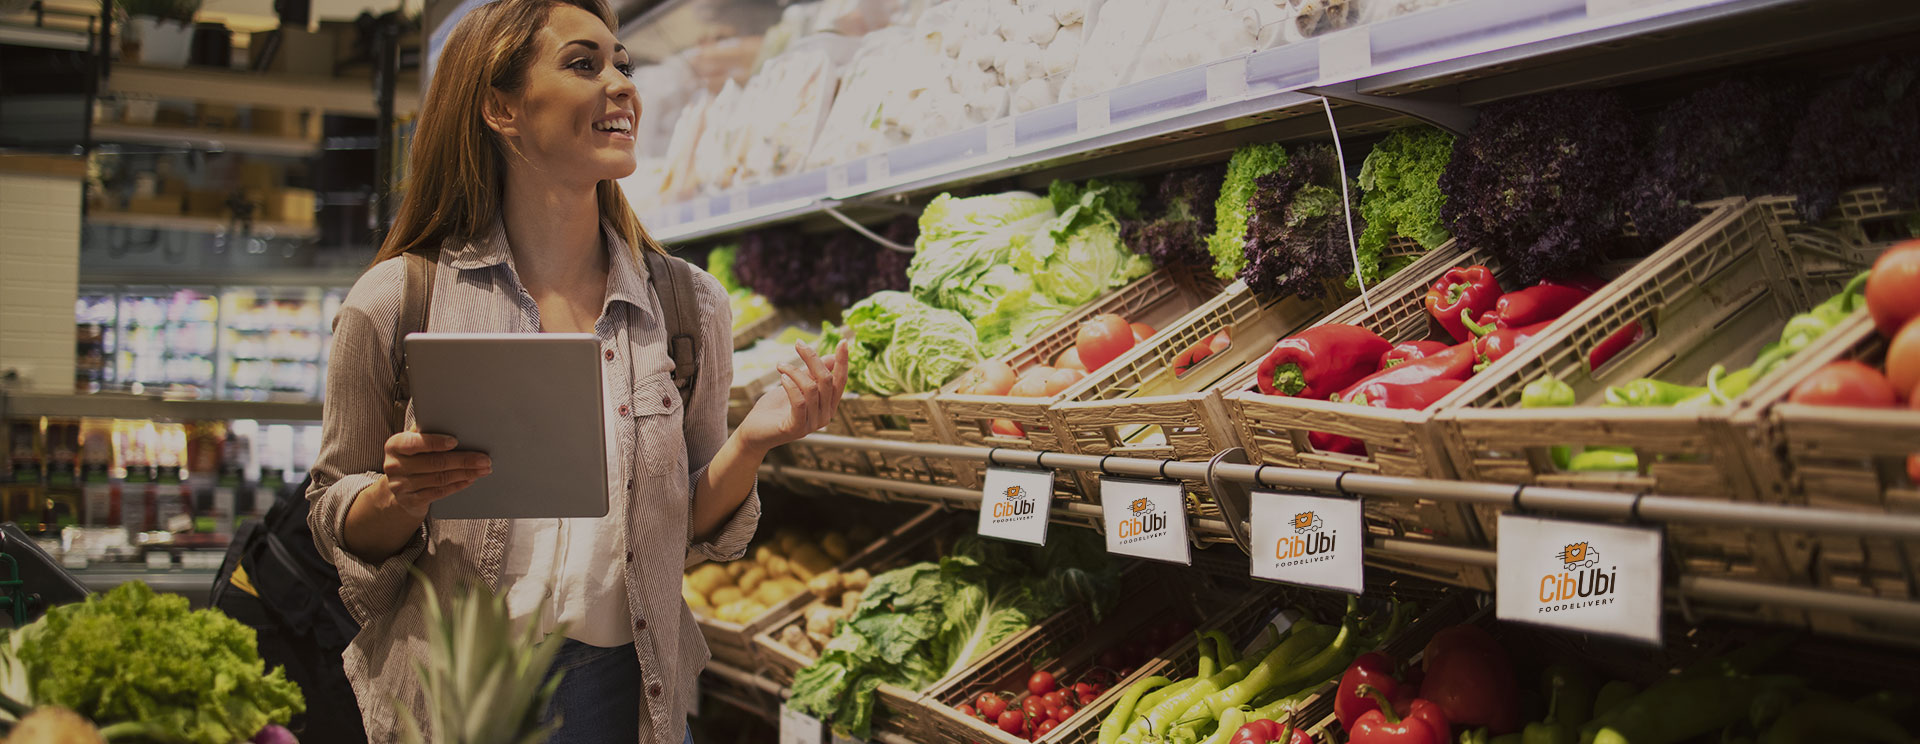 Negozio Alimentari Online - Cibubi